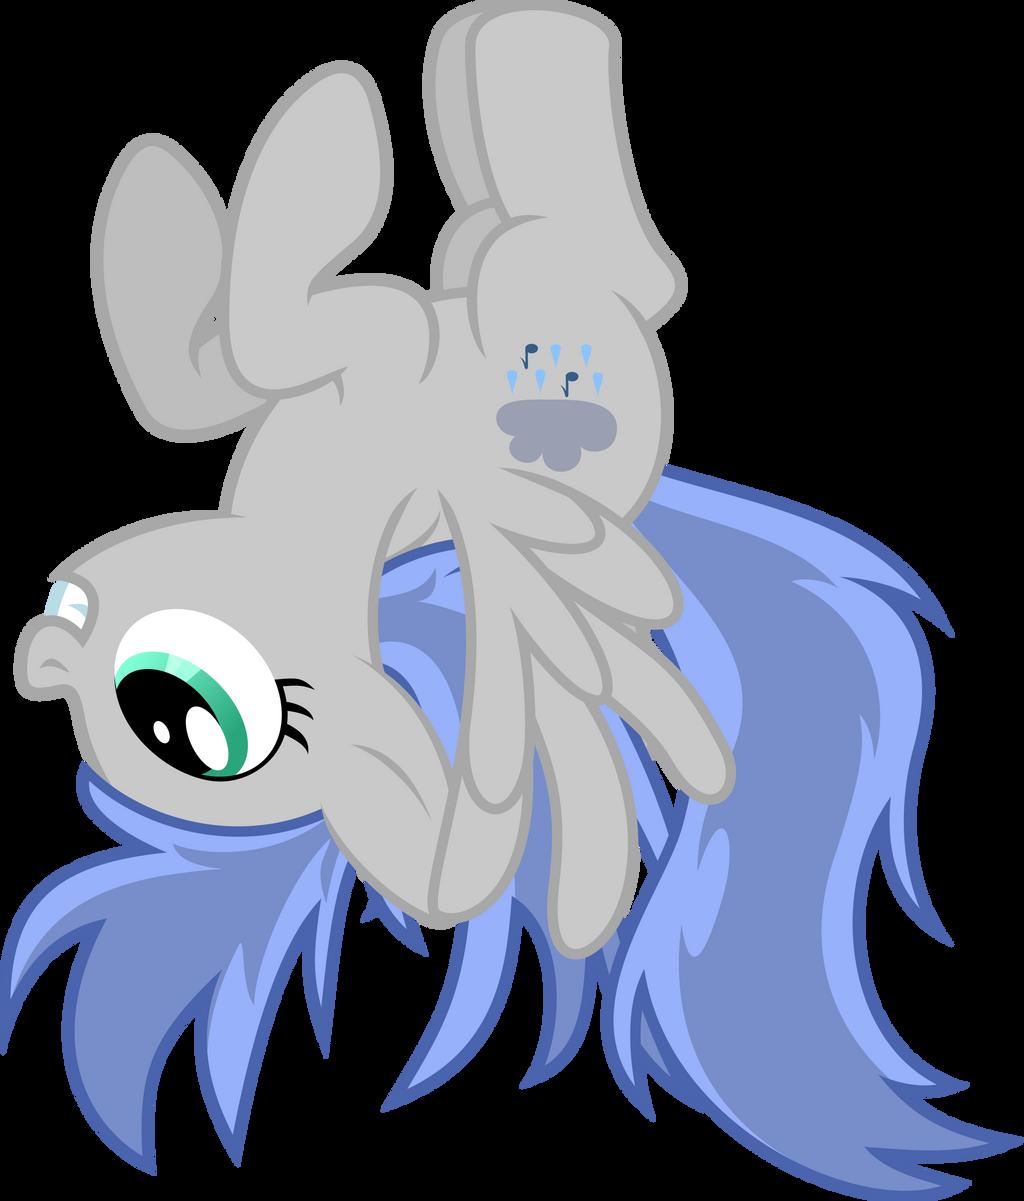 Silverrains upsidedown by RainbowRage12